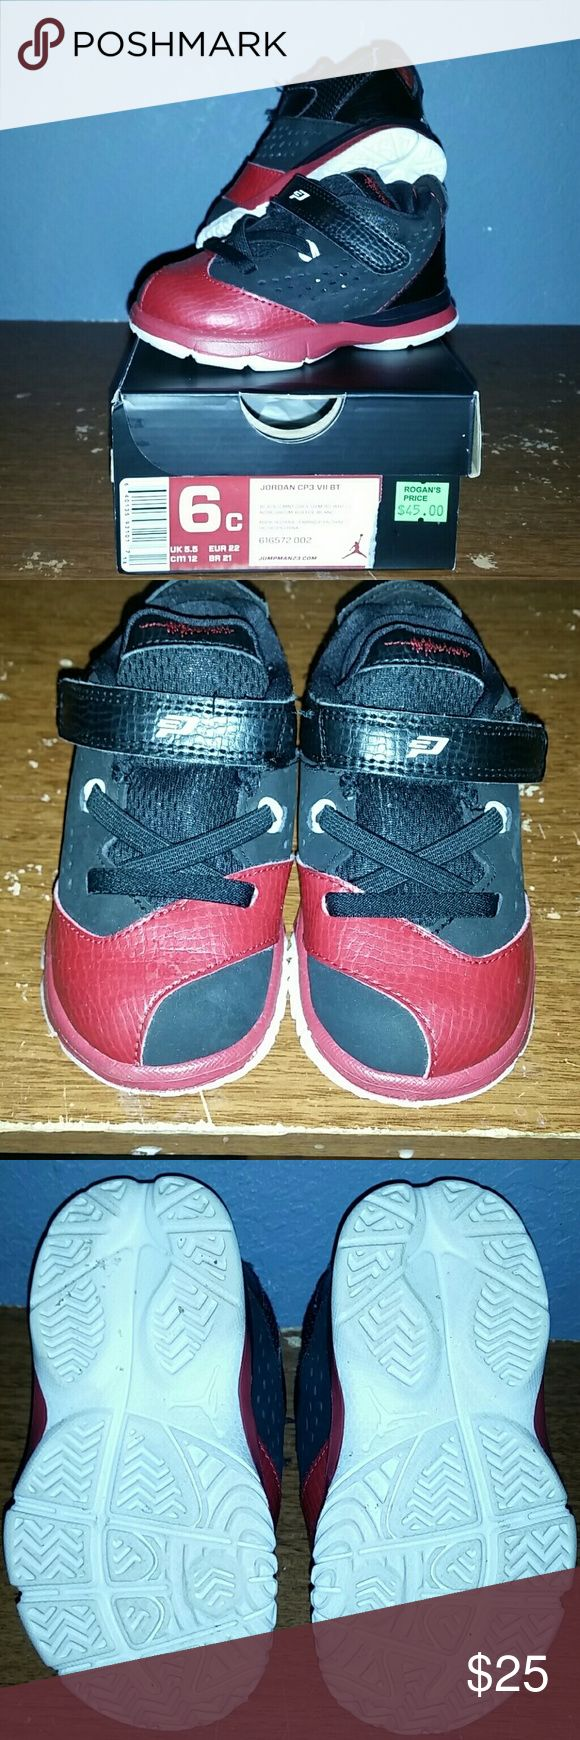 Toddler Jordan basketball shoes Toddler boys size 6 Jordan CP3 VII ....wore only 2x still new condition. Jordan Shoes Sneakers